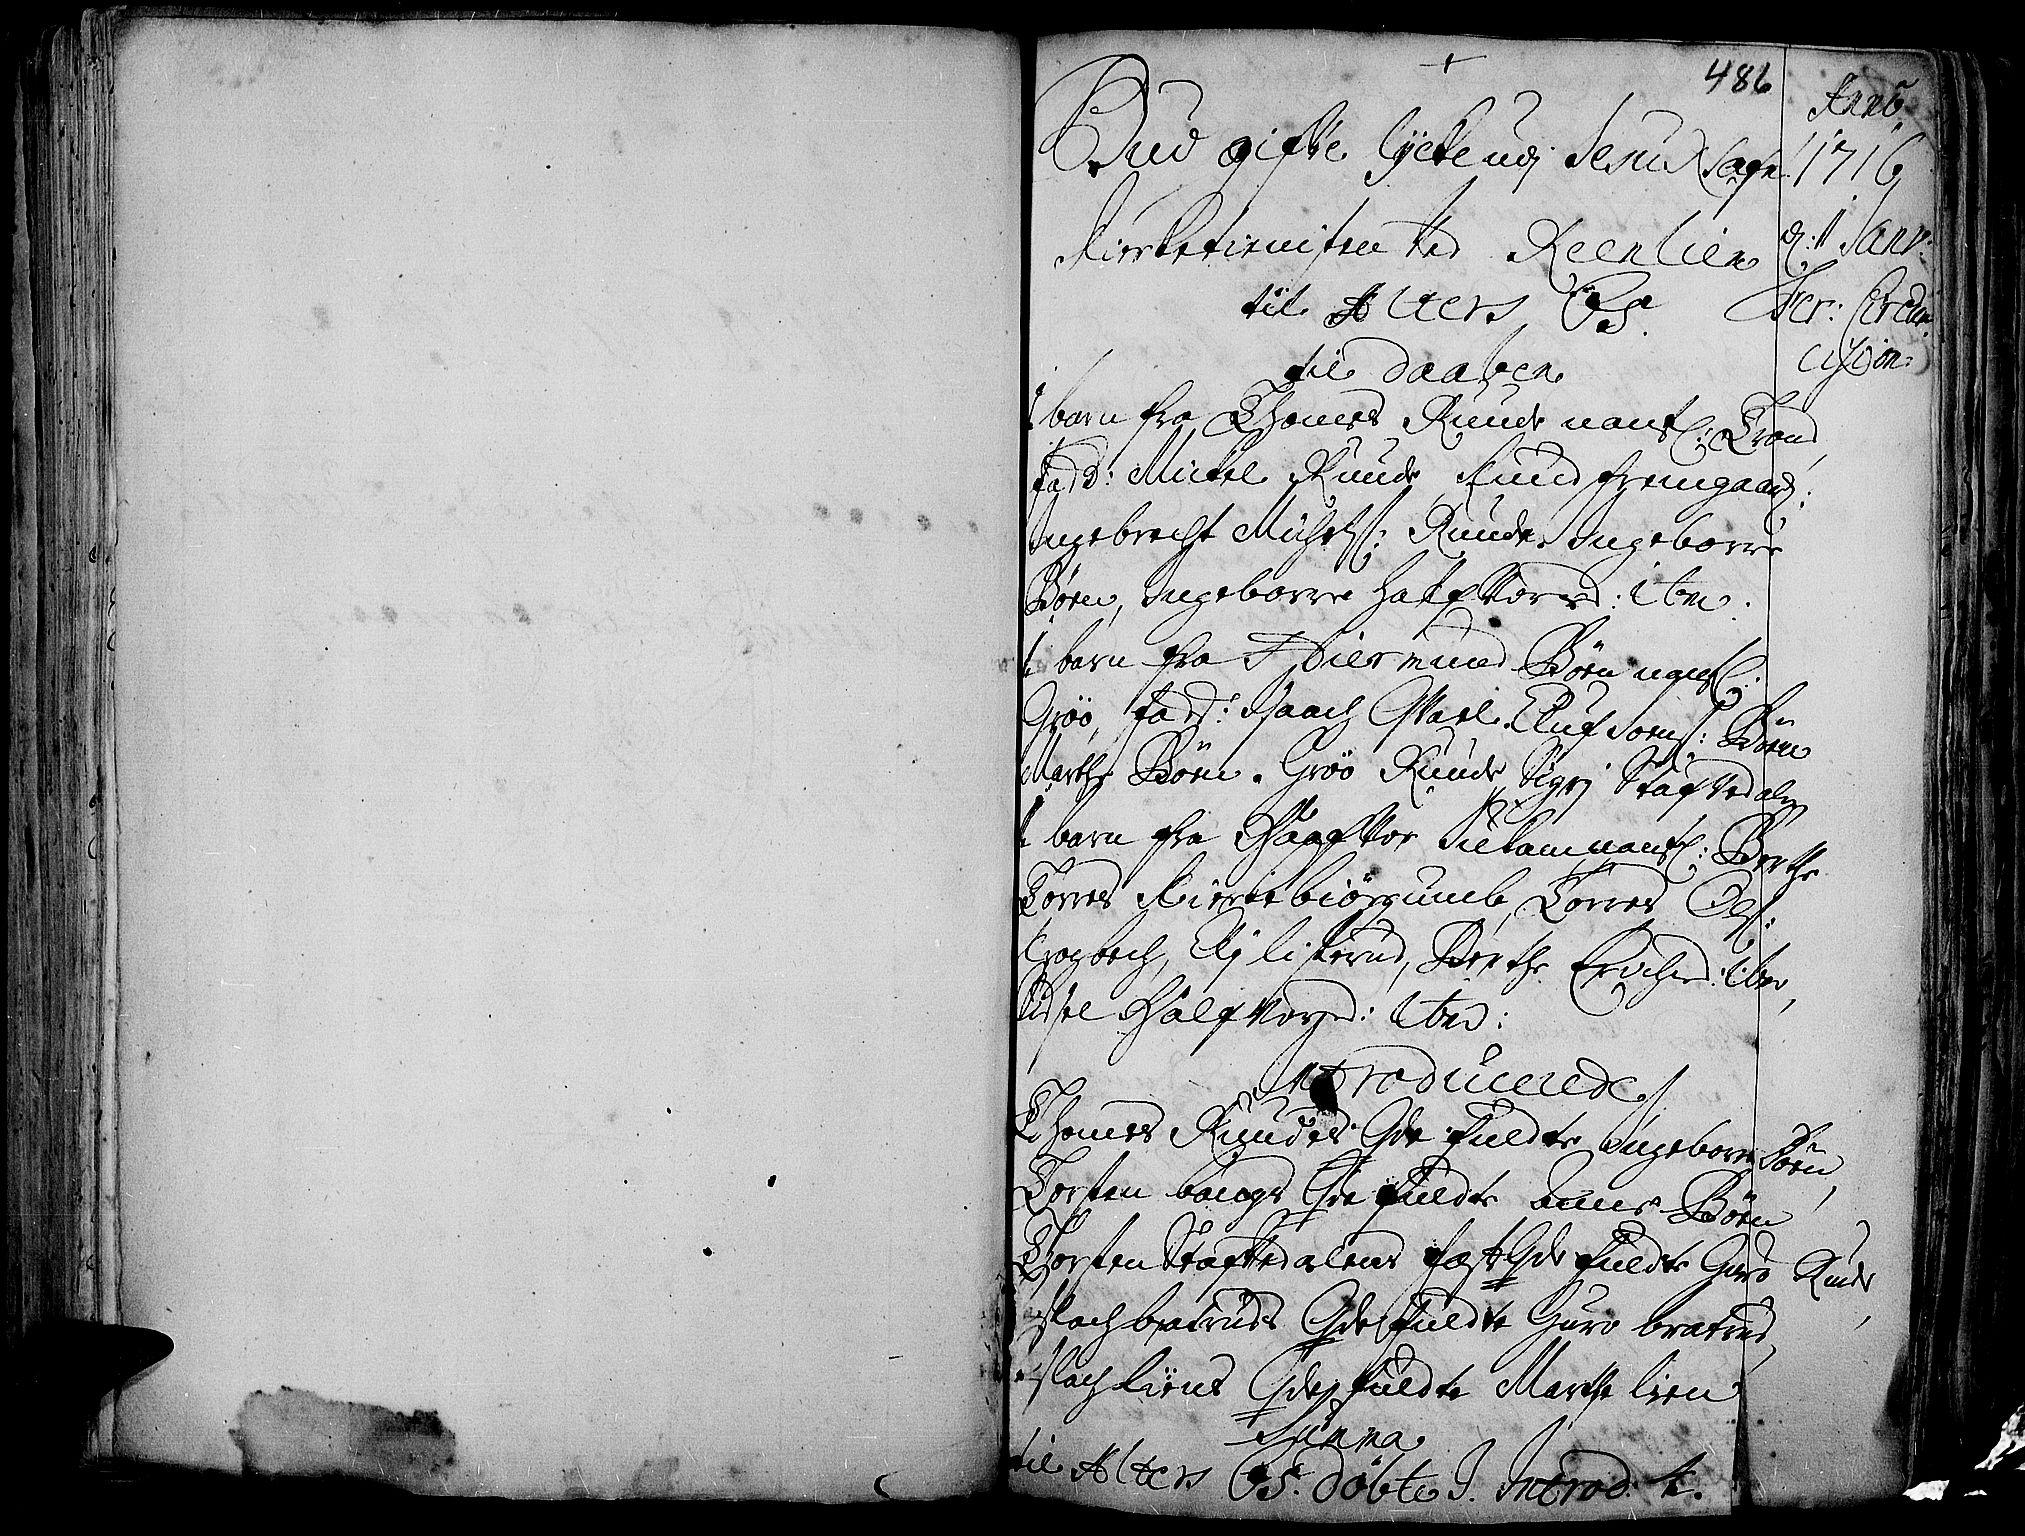 SAH, Aurdal prestekontor, Ministerialbok nr. 1-3, 1692-1730, s. 486